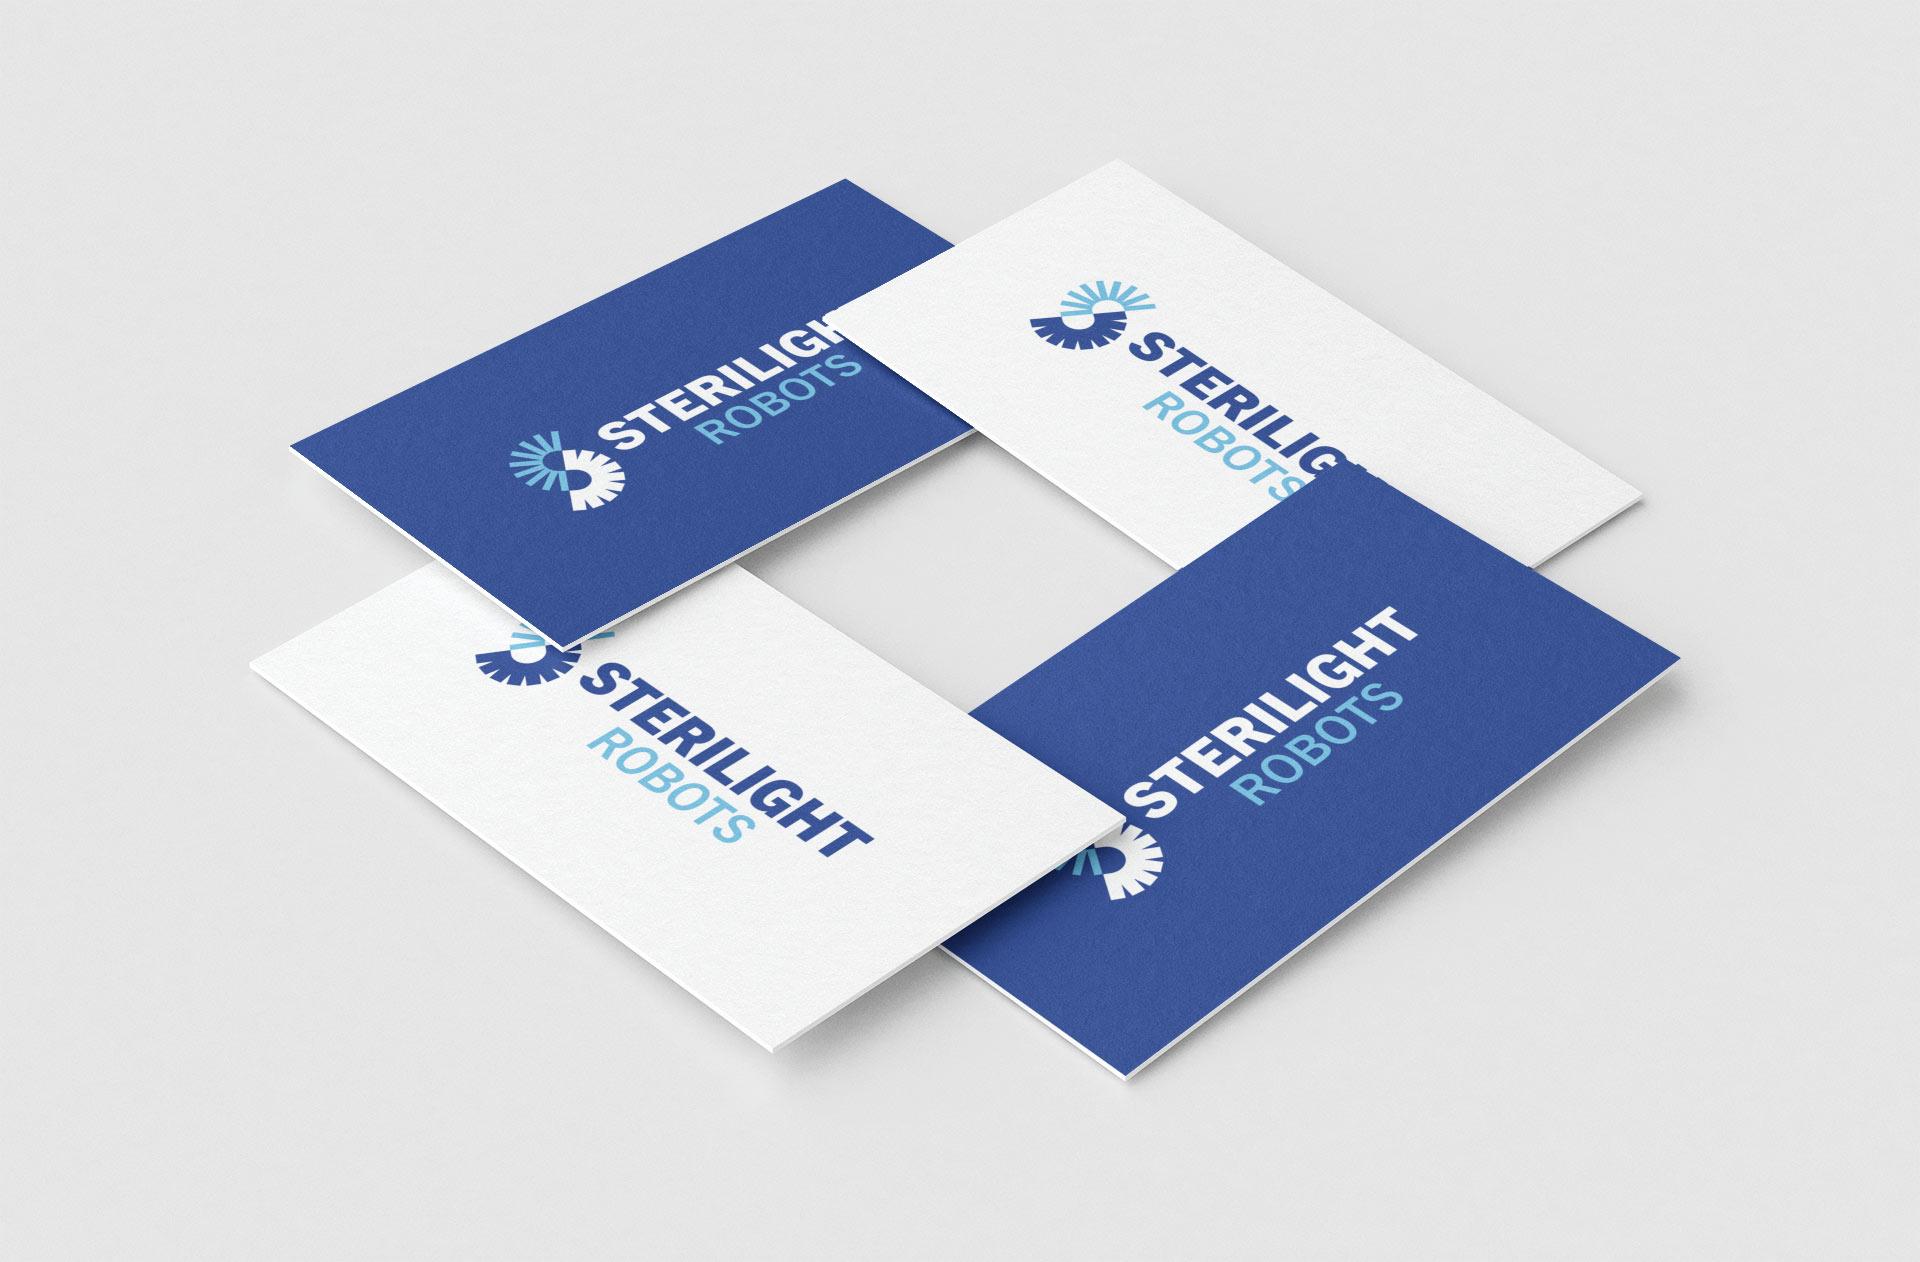 Sterilight Logo Presented on Business Cards